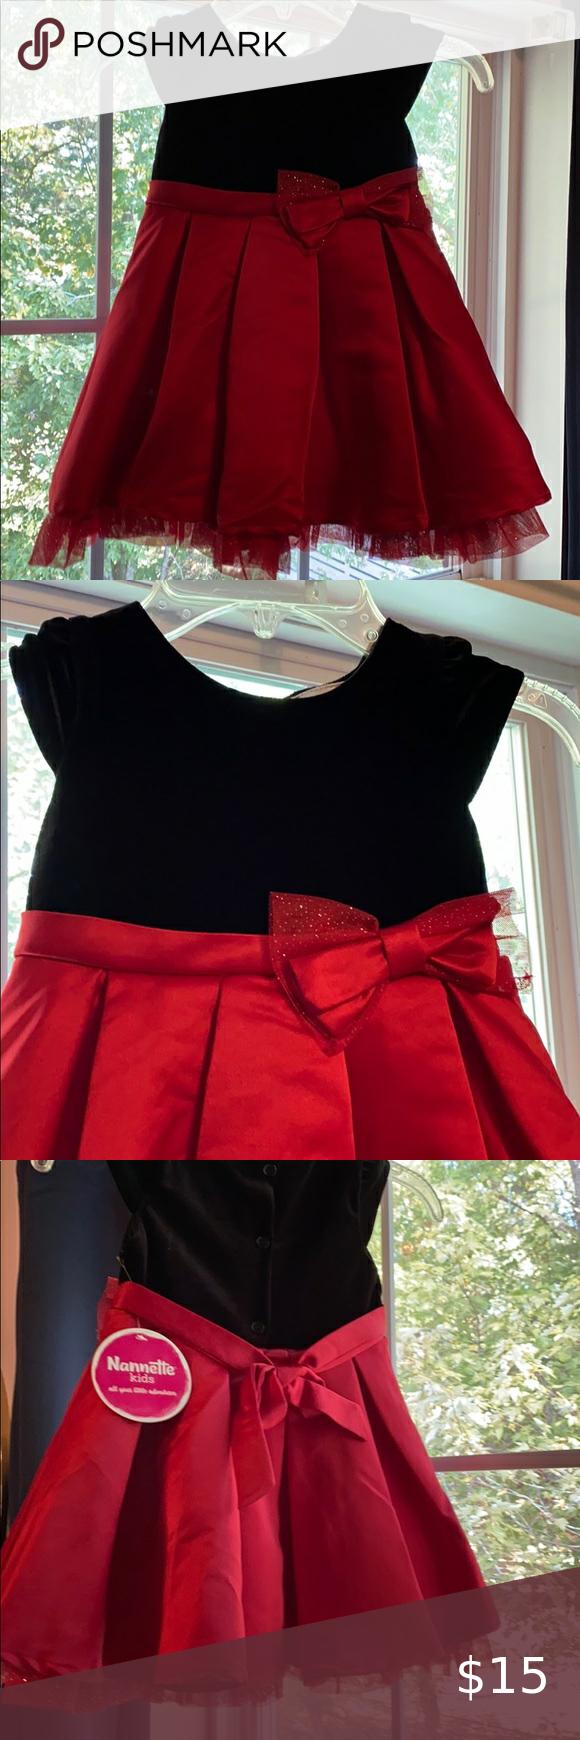 Nwt Red And Black Dress Black Dress Red Skirts Velvet Fashion [ 1740 x 580 Pixel ]